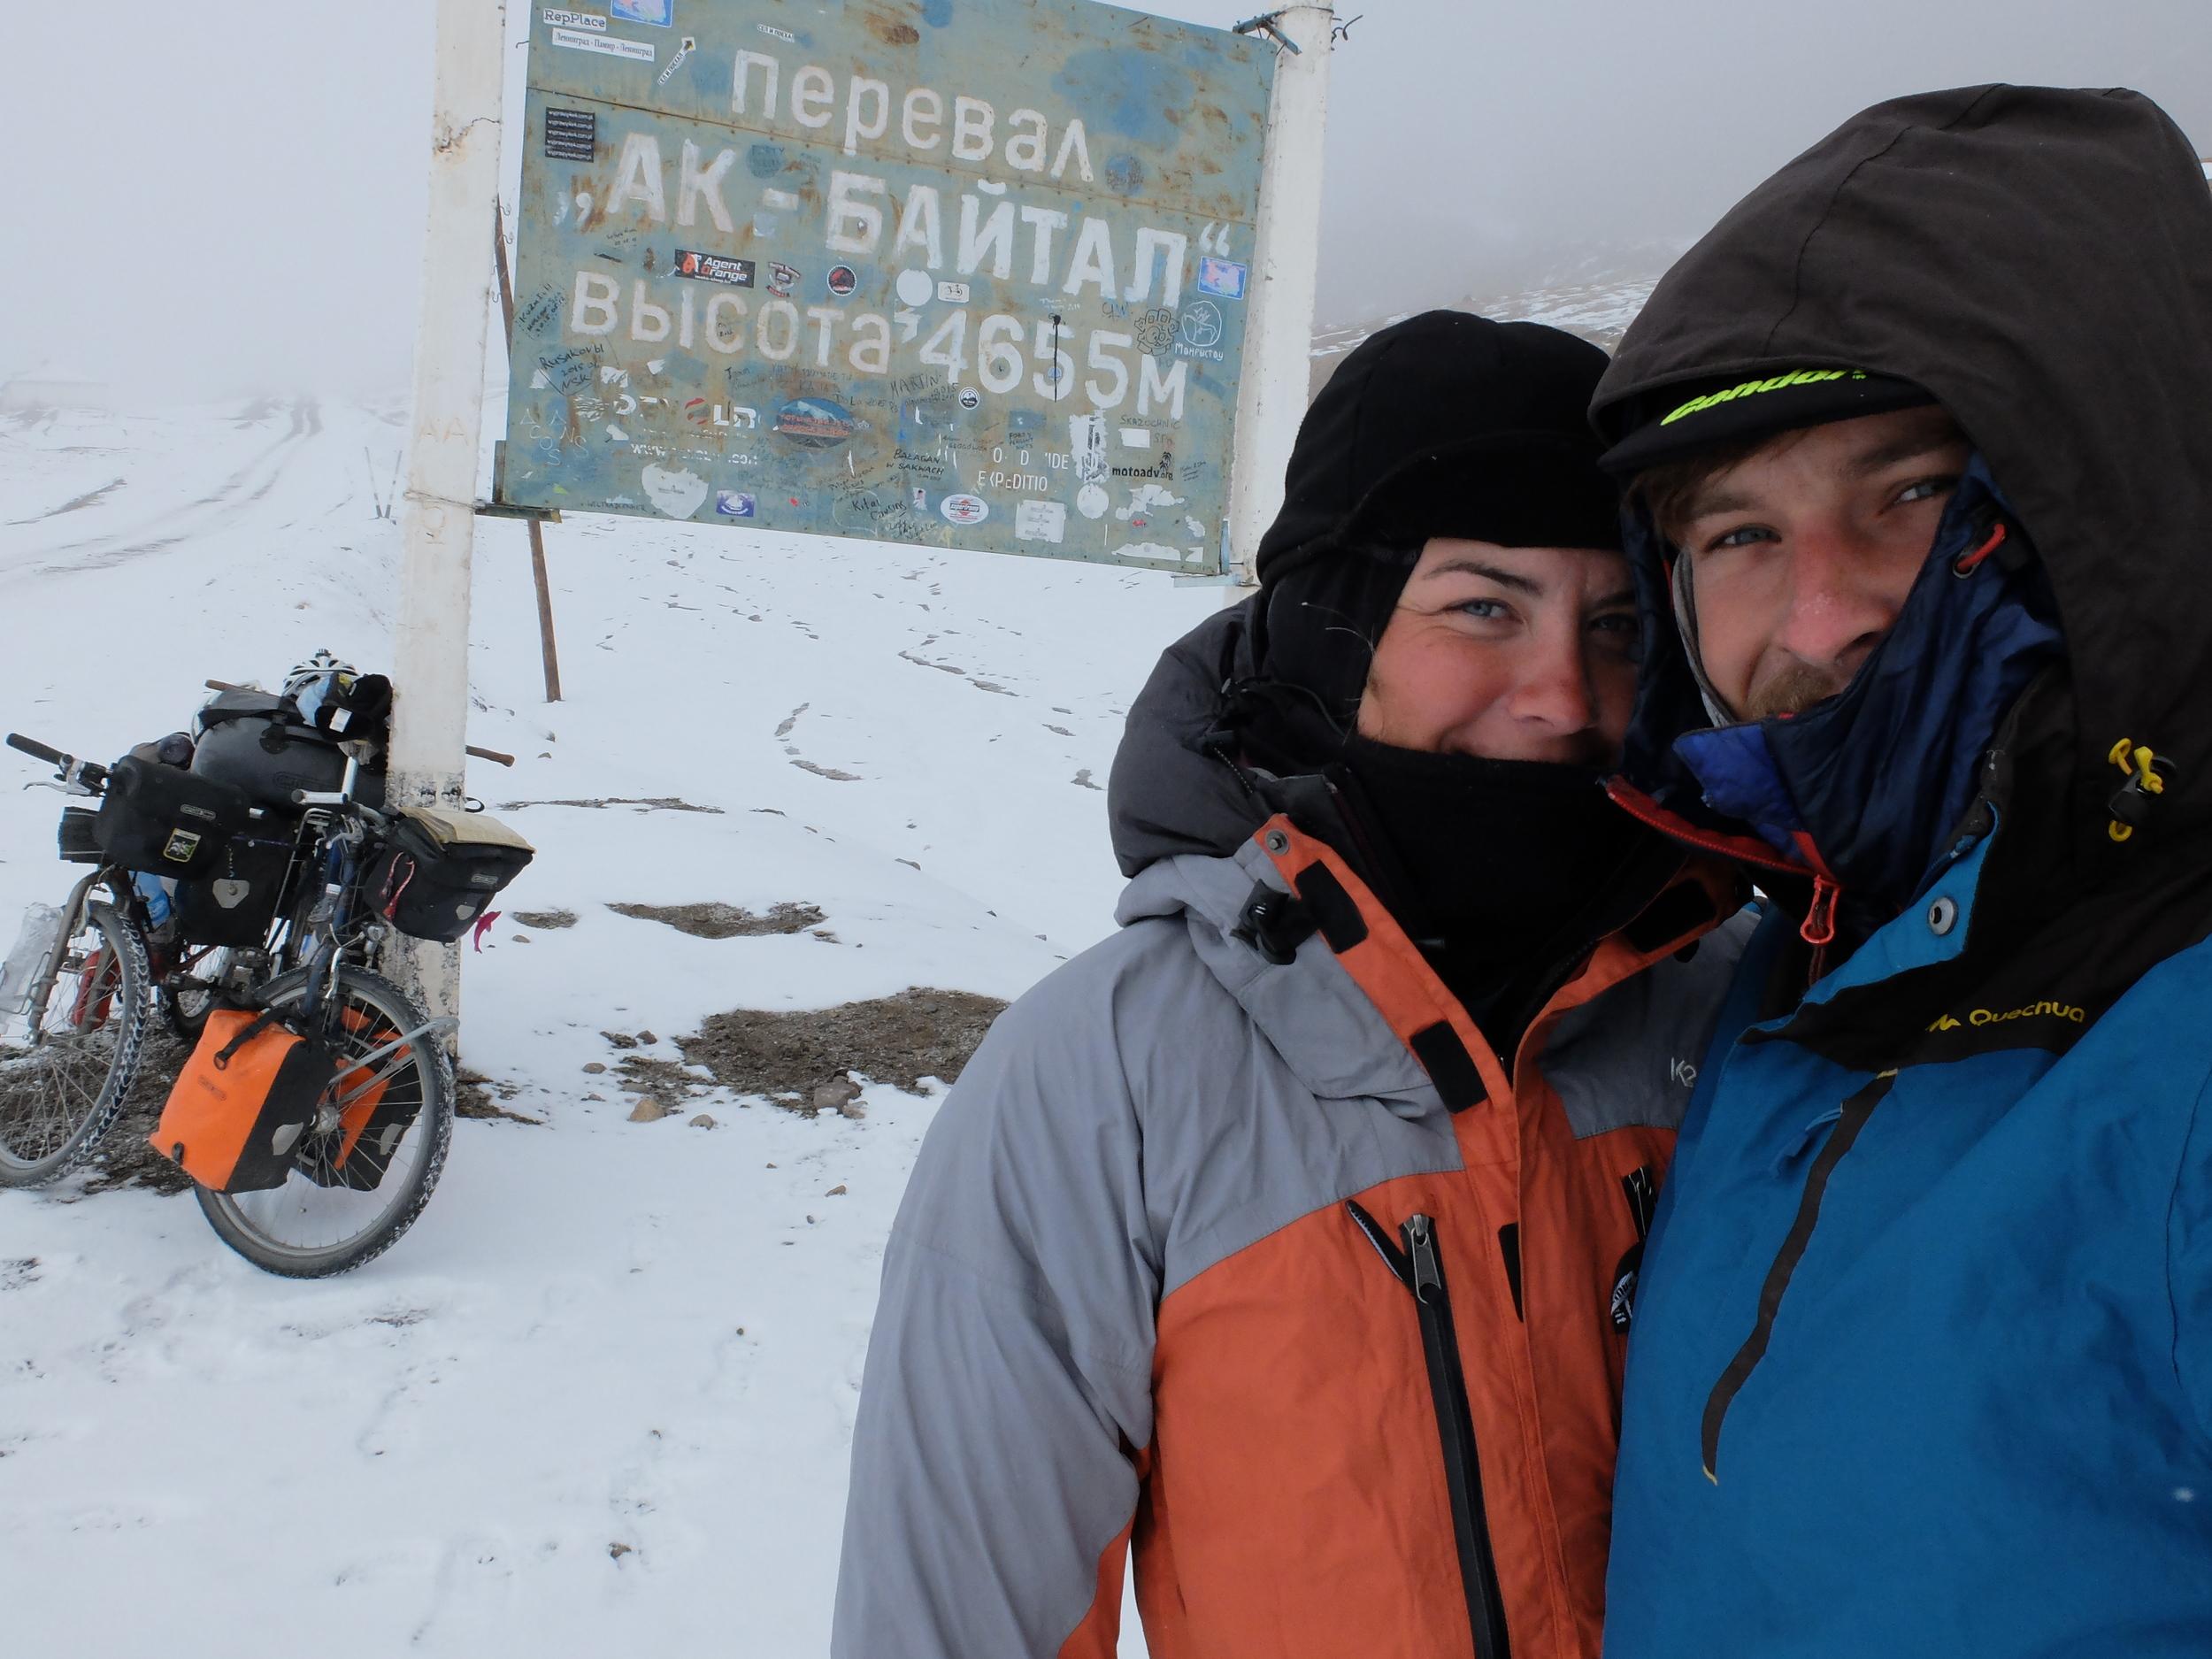 Akbaital pass 4655m